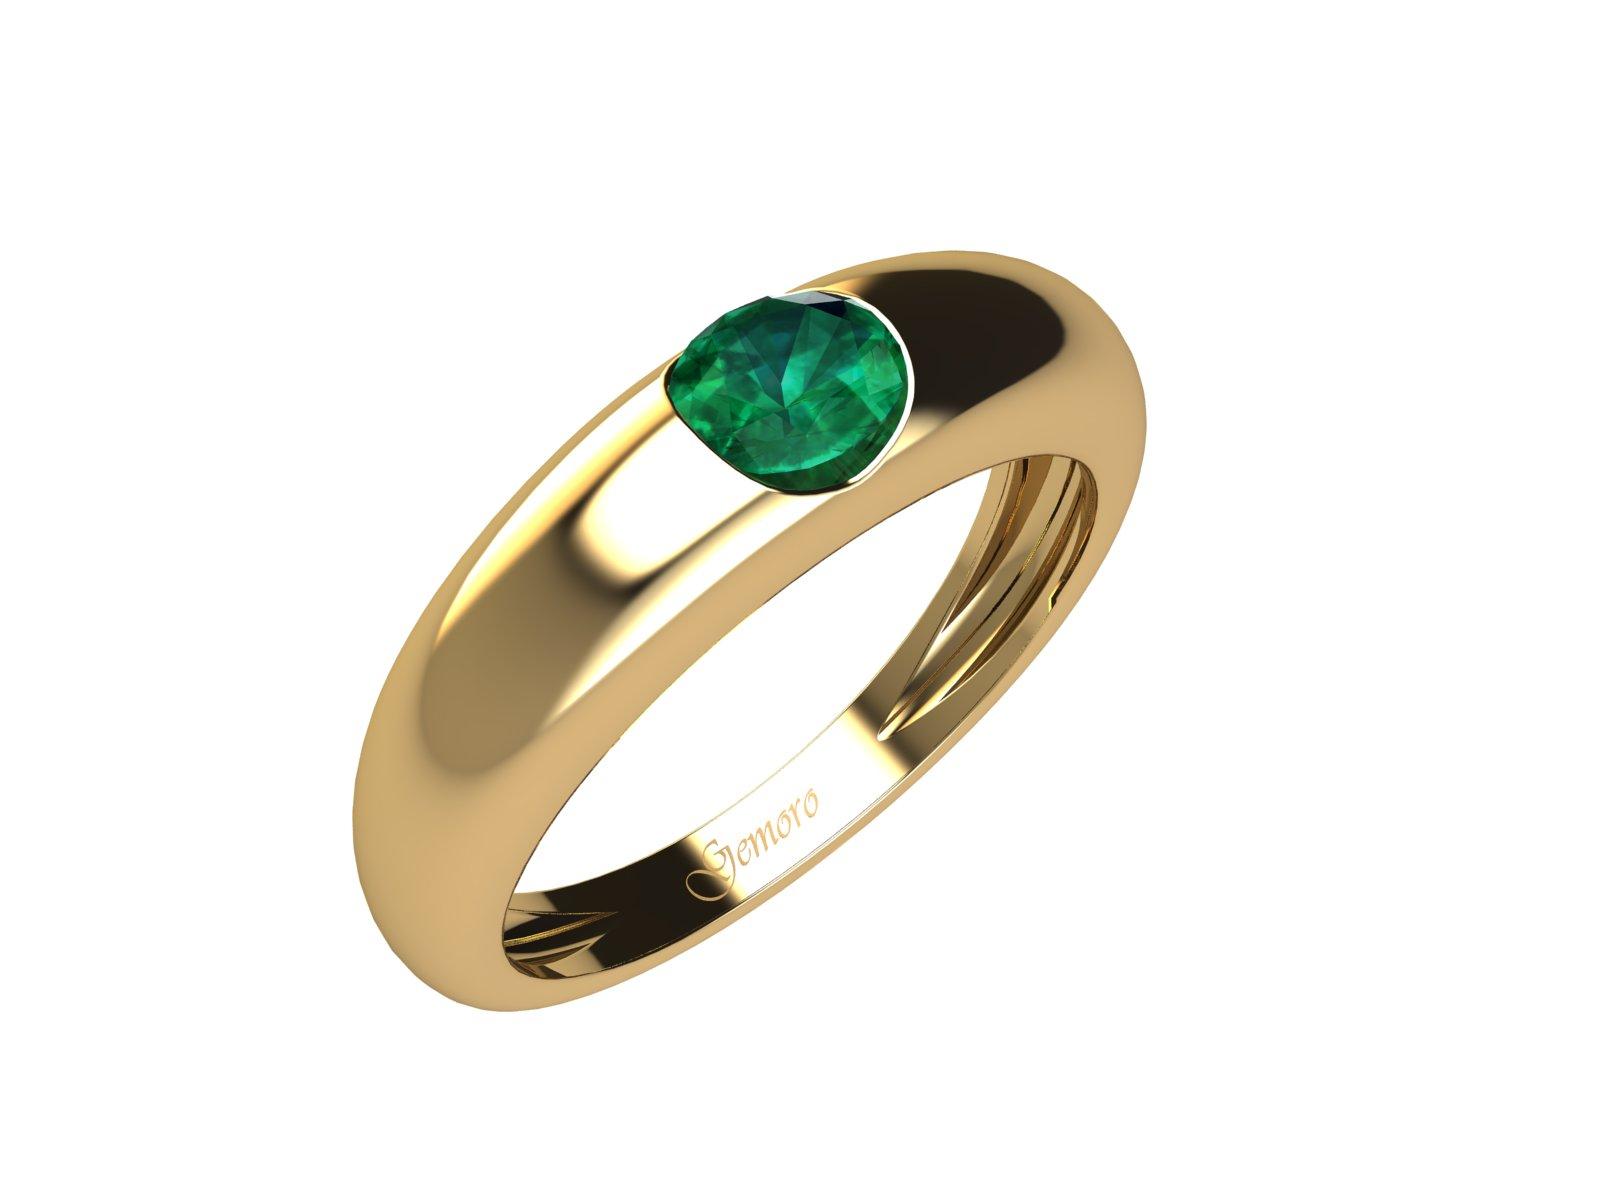 AC403GIA.SM – Anello in oro giallo 18kt con Smeraldo Naturale